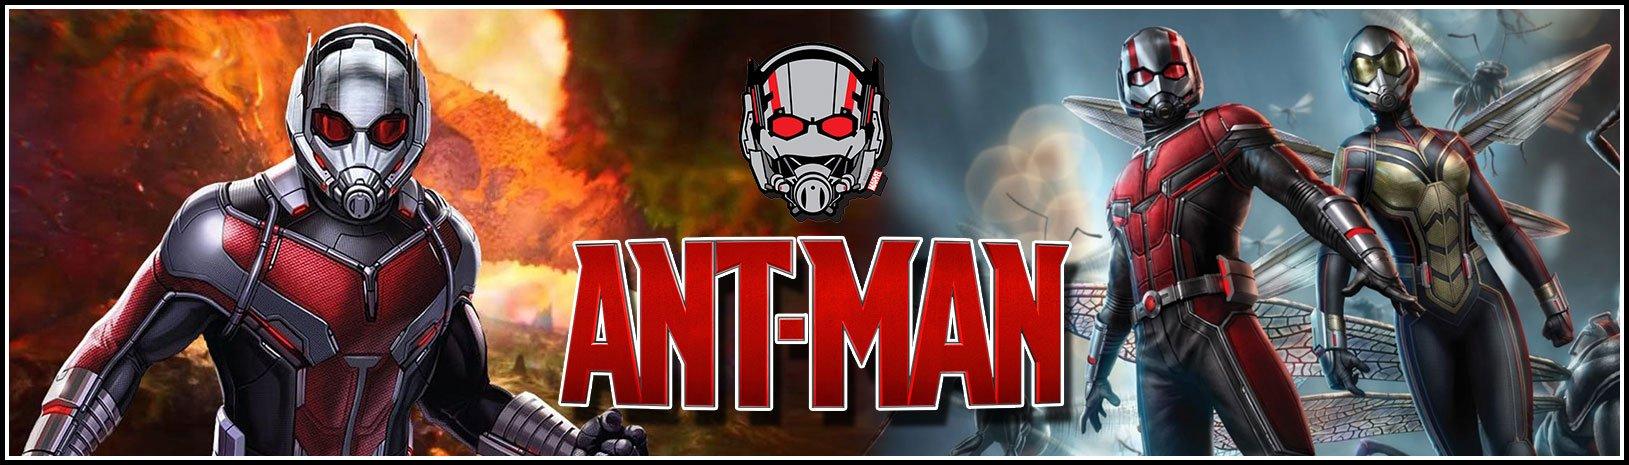 ant man shop